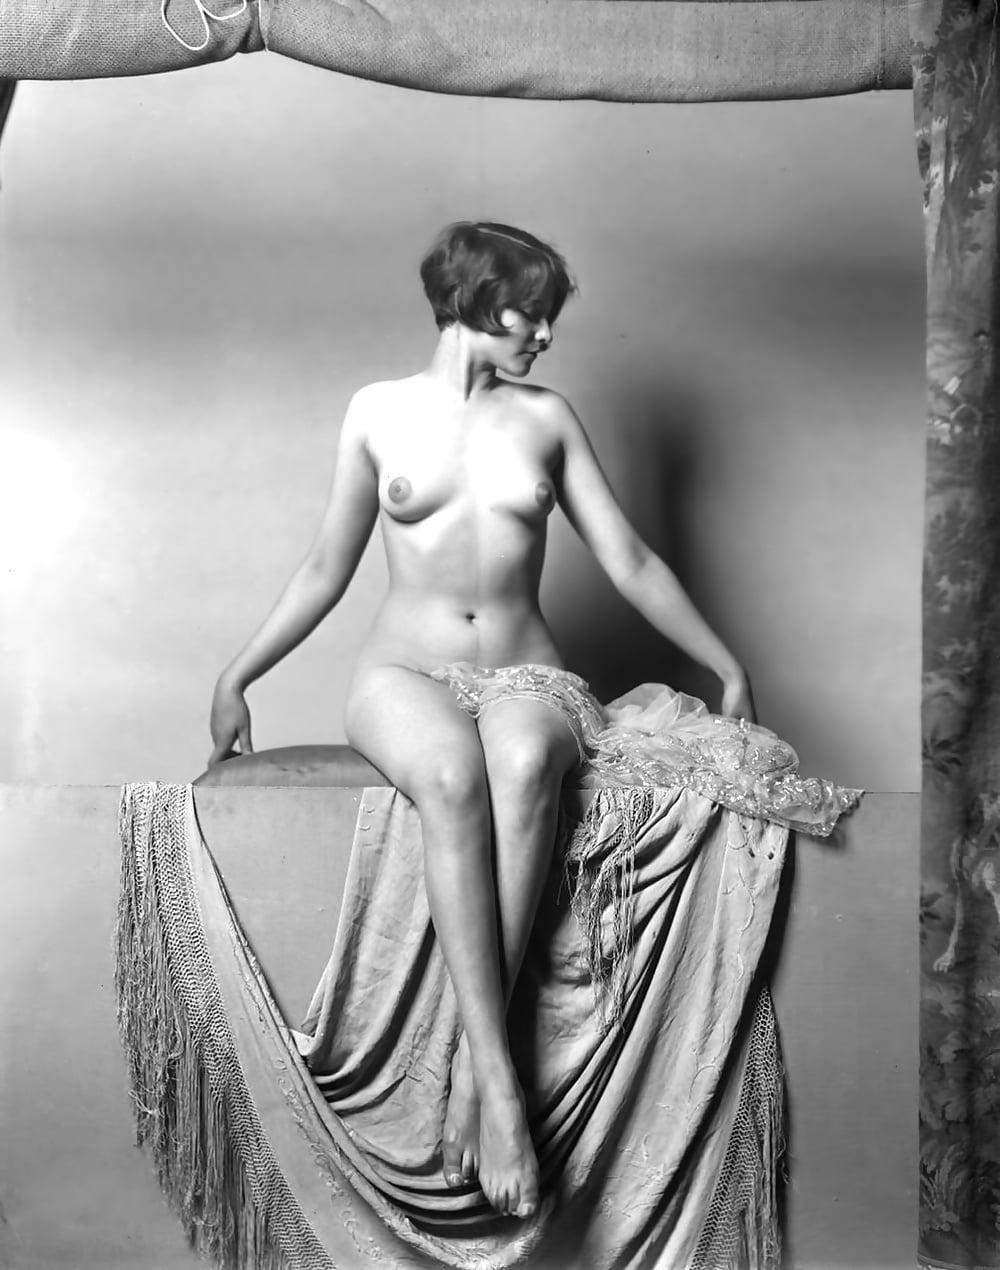 nakachivanie-staroe-retro-erotika